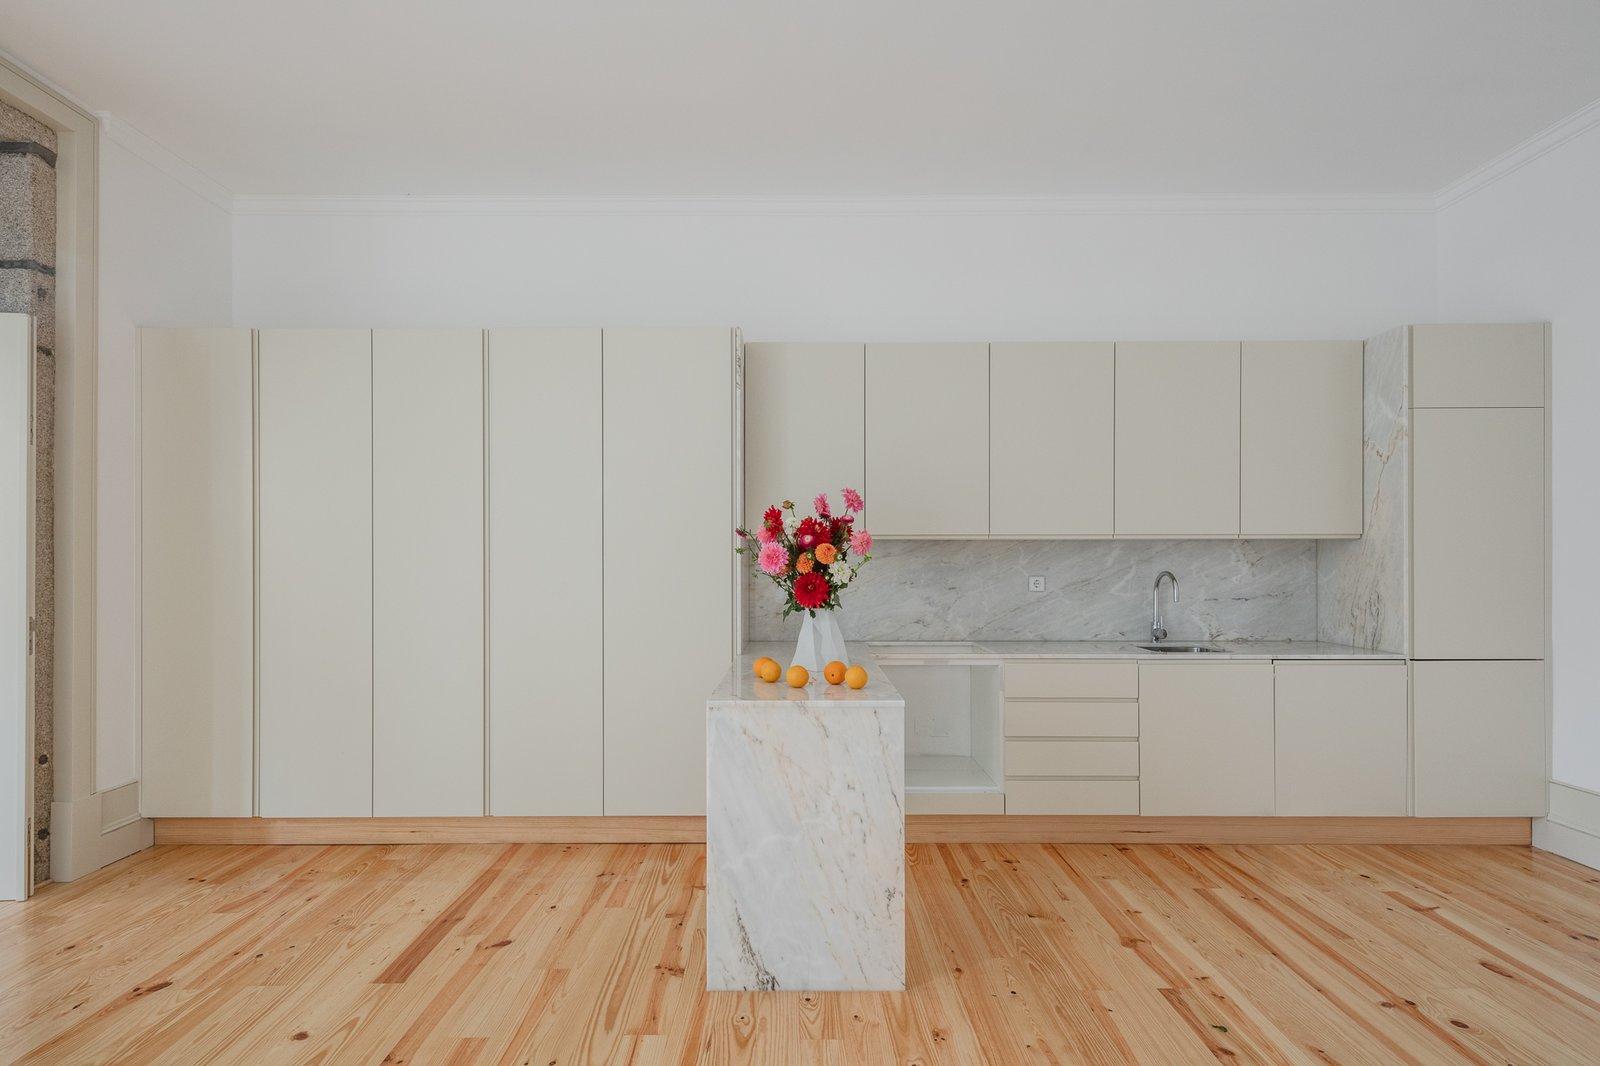 Kitchen, Marble Counter, White Cabinet, and Light Hardwood Floor  Rua da Boavista